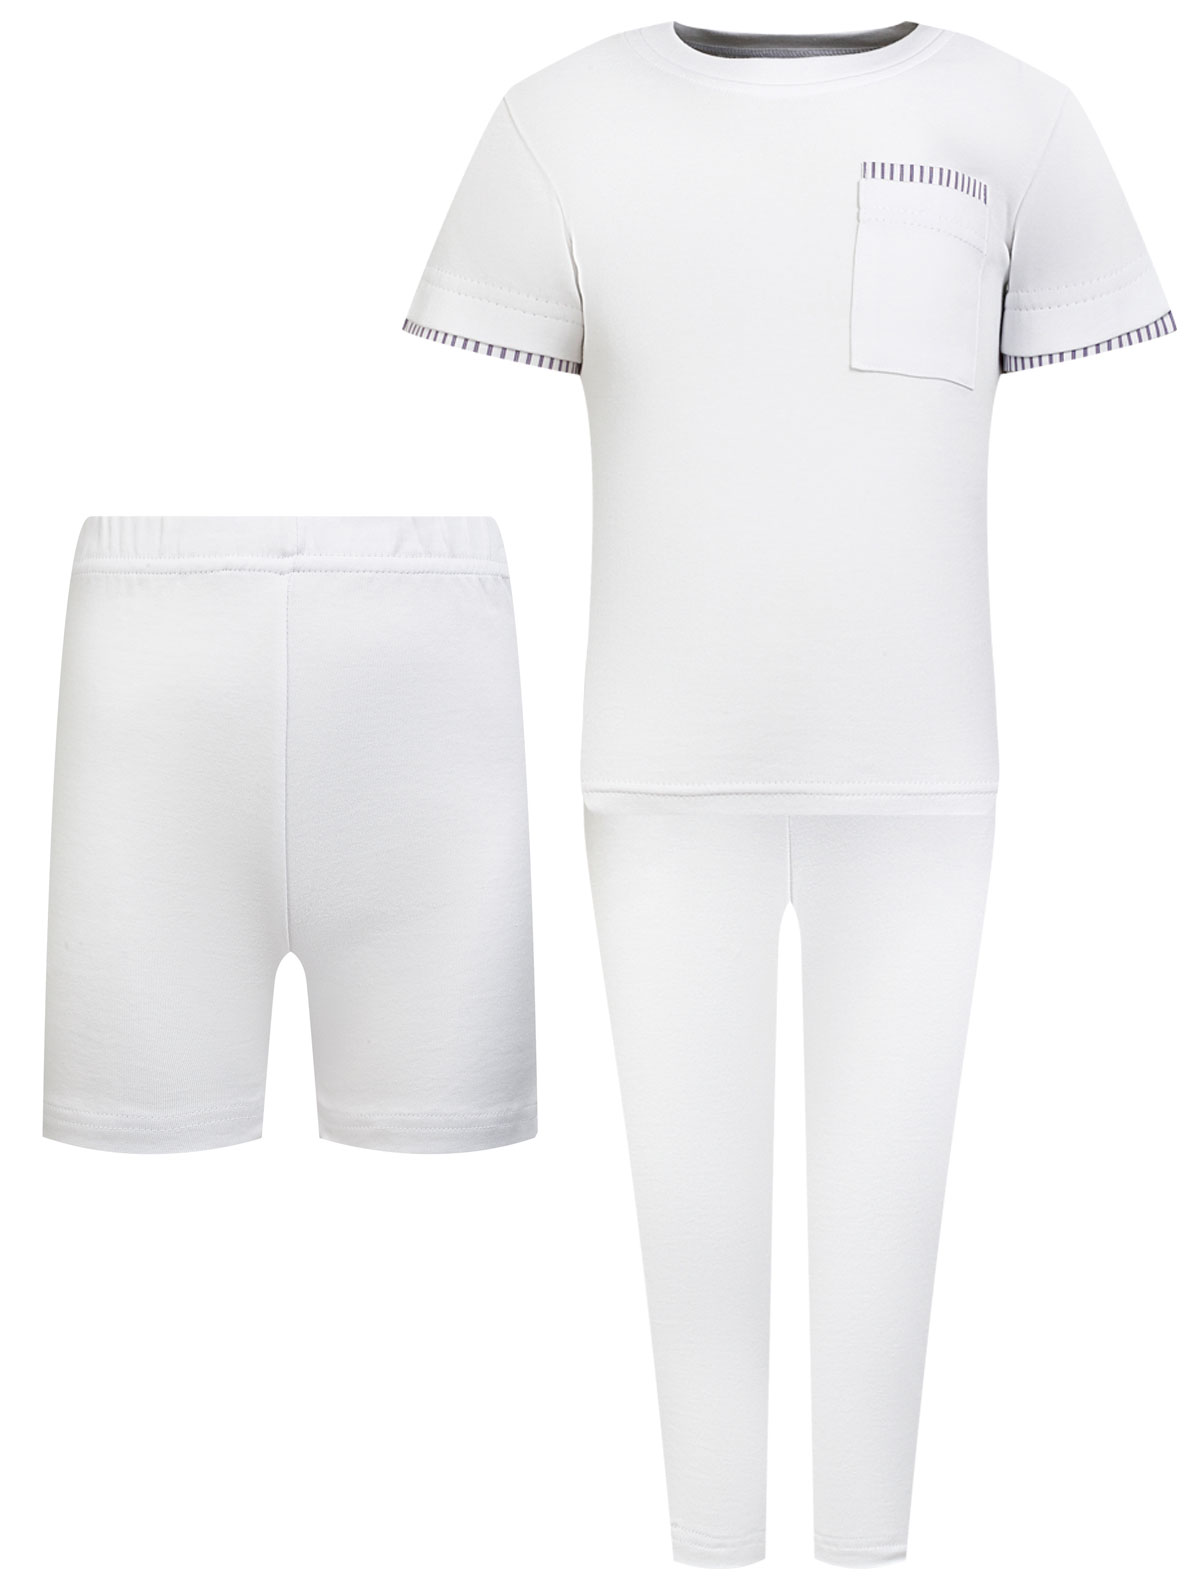 Купить 2351123, Пижама Backary, белый, 0214520180054